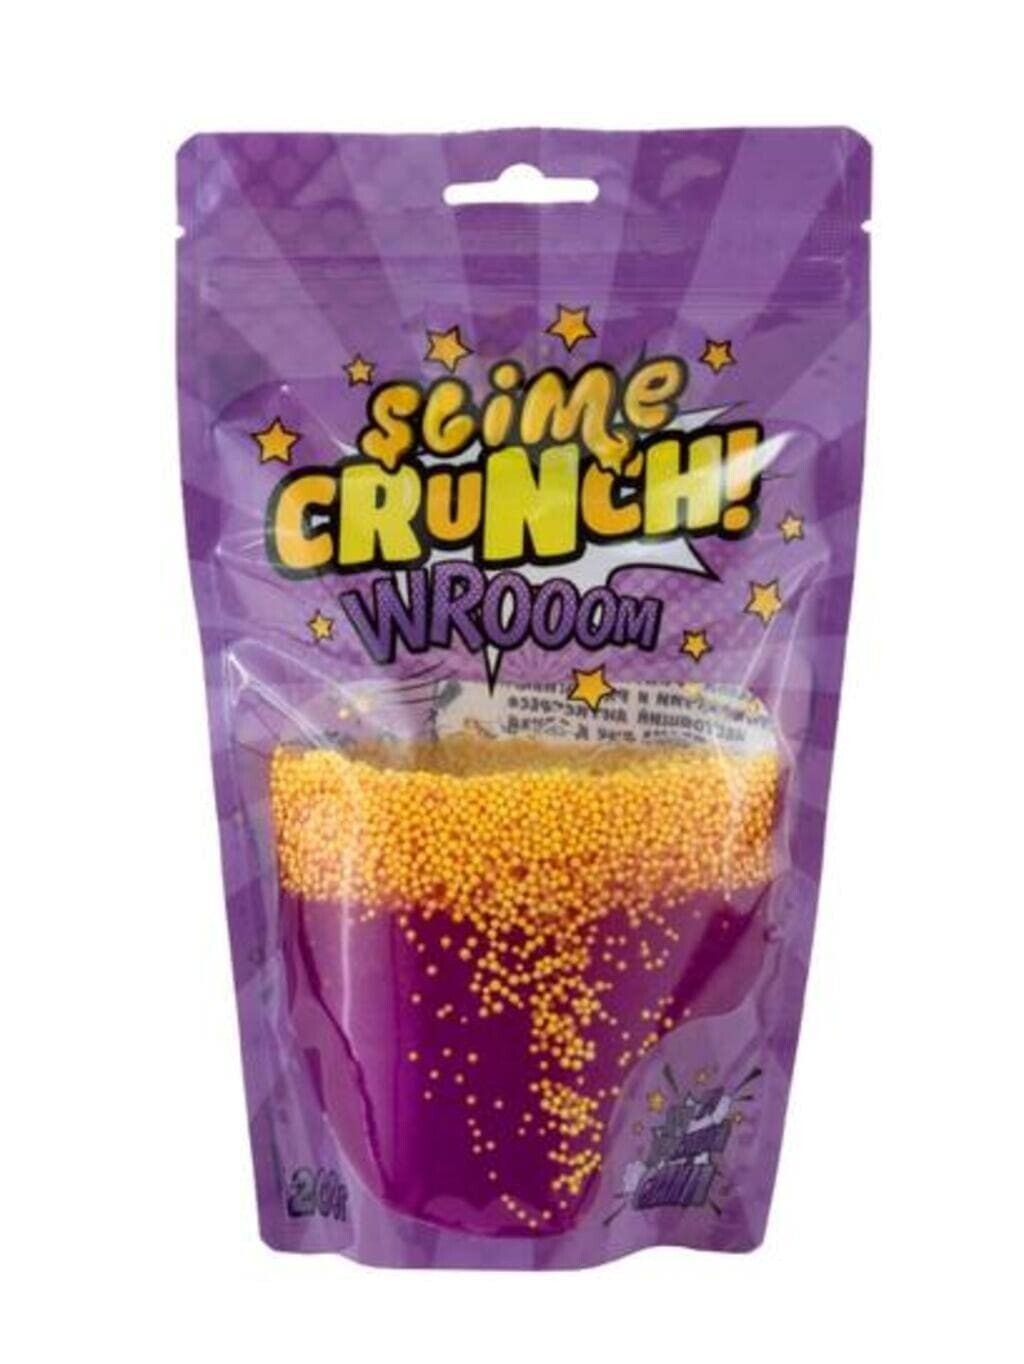 Crunch-slime WROOM с ароматом фейхоа, 200 г